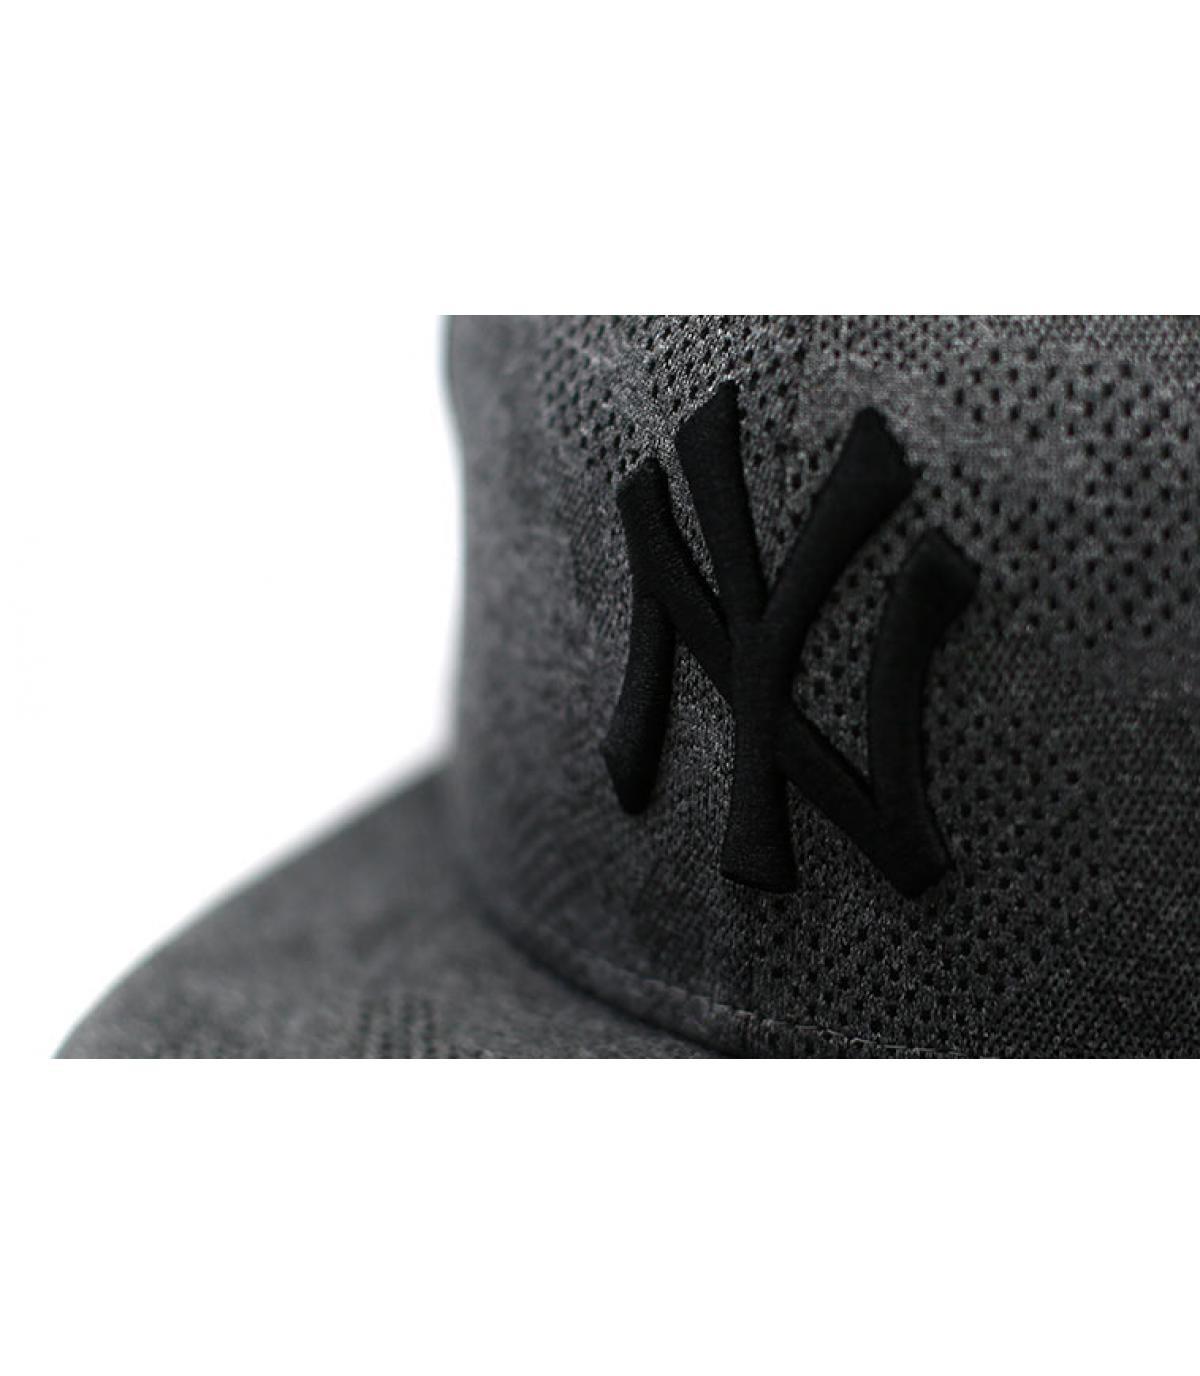 Details Snapback Engineered Plus NY 950 gray black - Abbildung 3